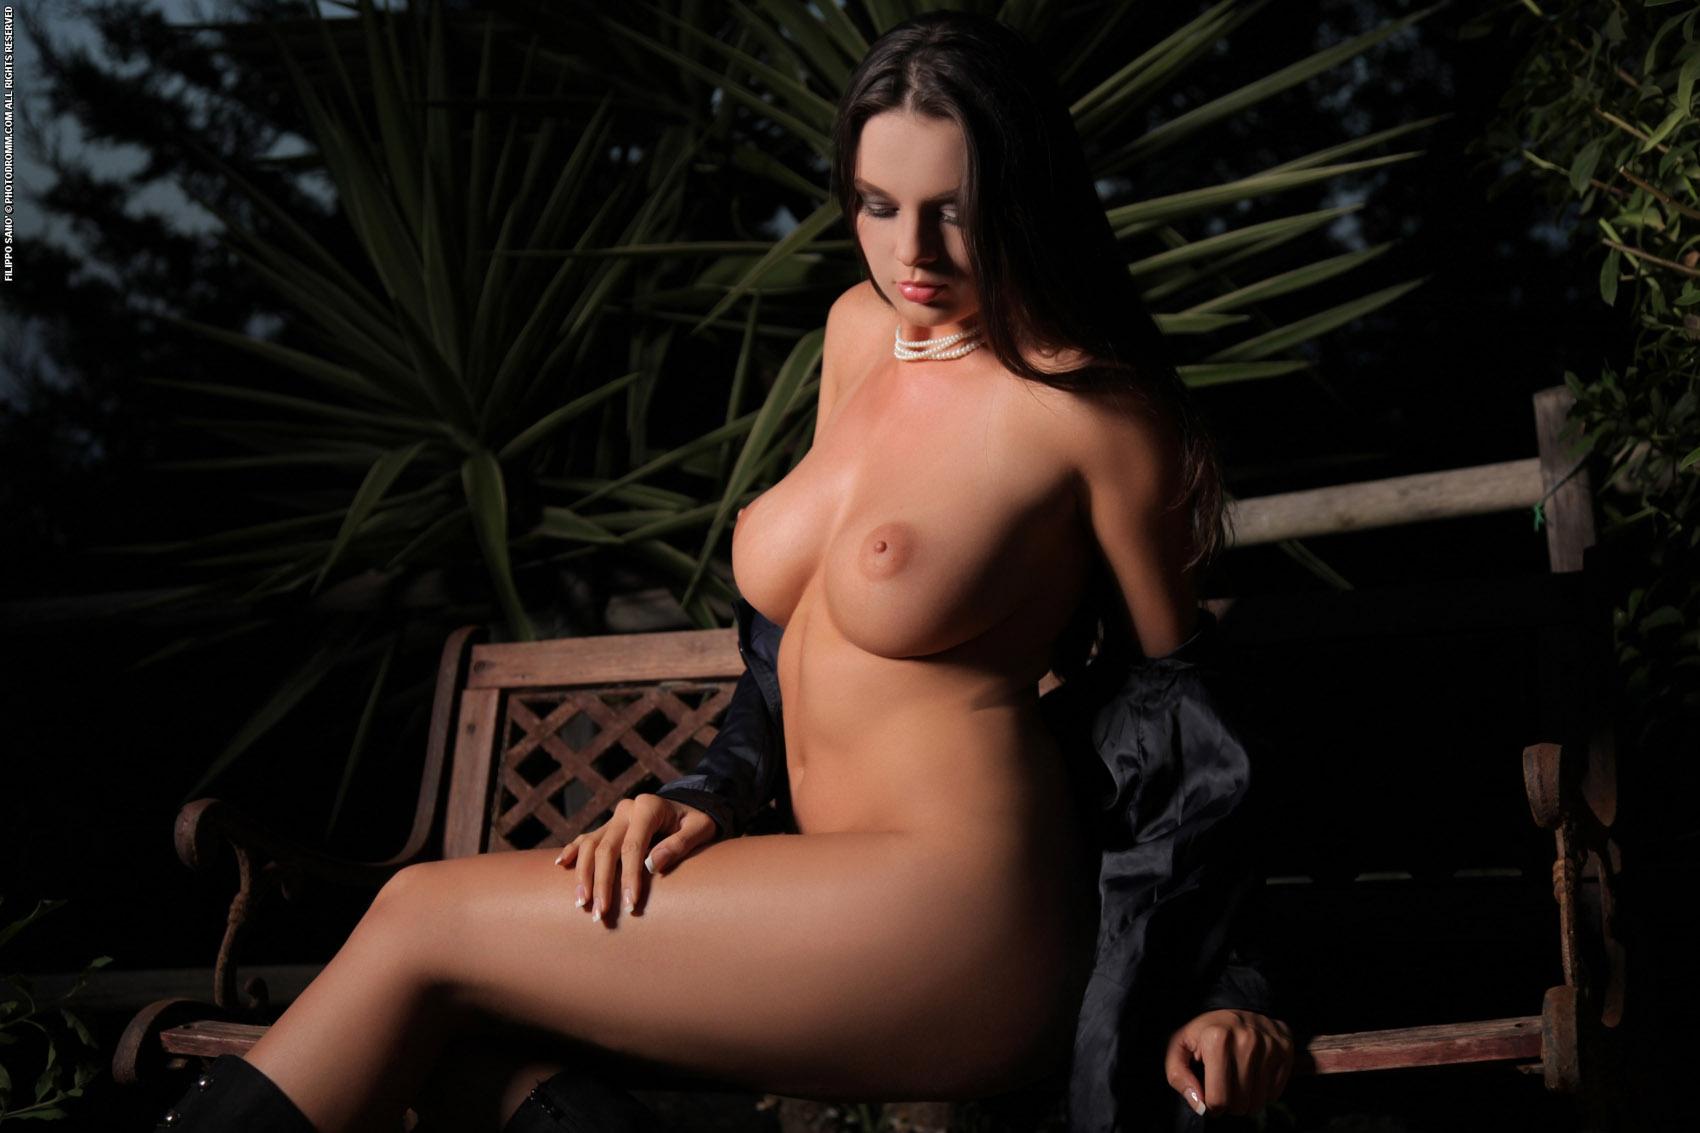 Winona ryder nude